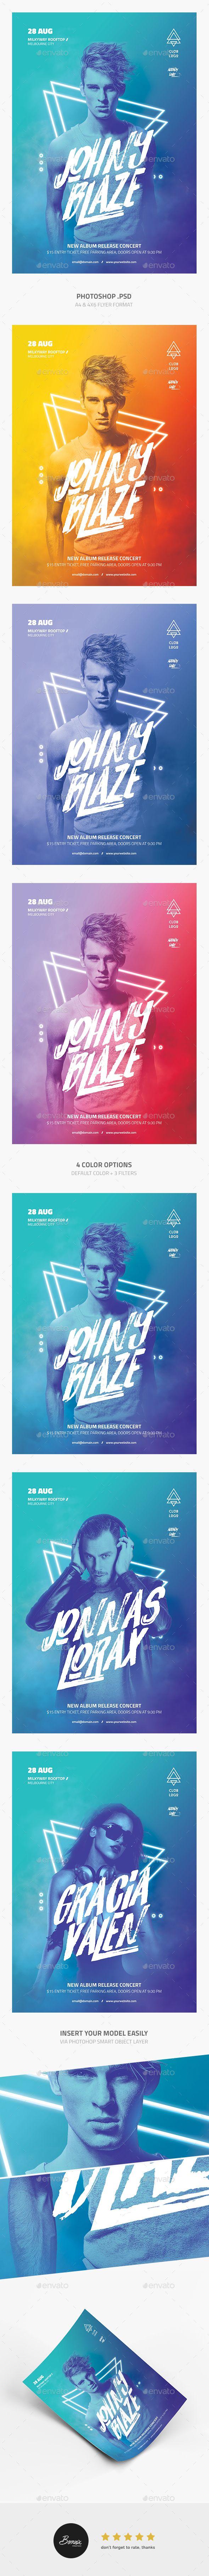 DJ Concert #Flyer - #Concerts Events Download here:  https://graphicriver.net/item/dj-concert-flyer/19673649?ref=alena994